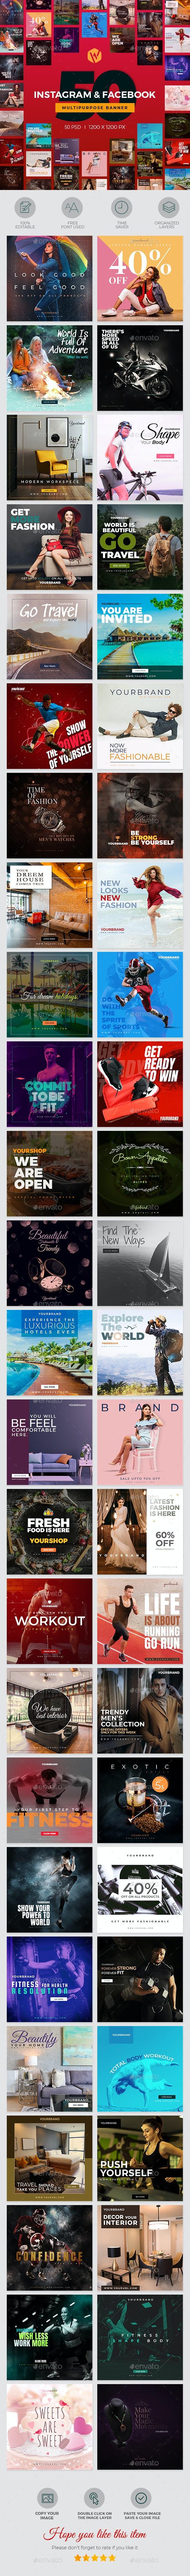 50 Instagram & Facebook Promotions